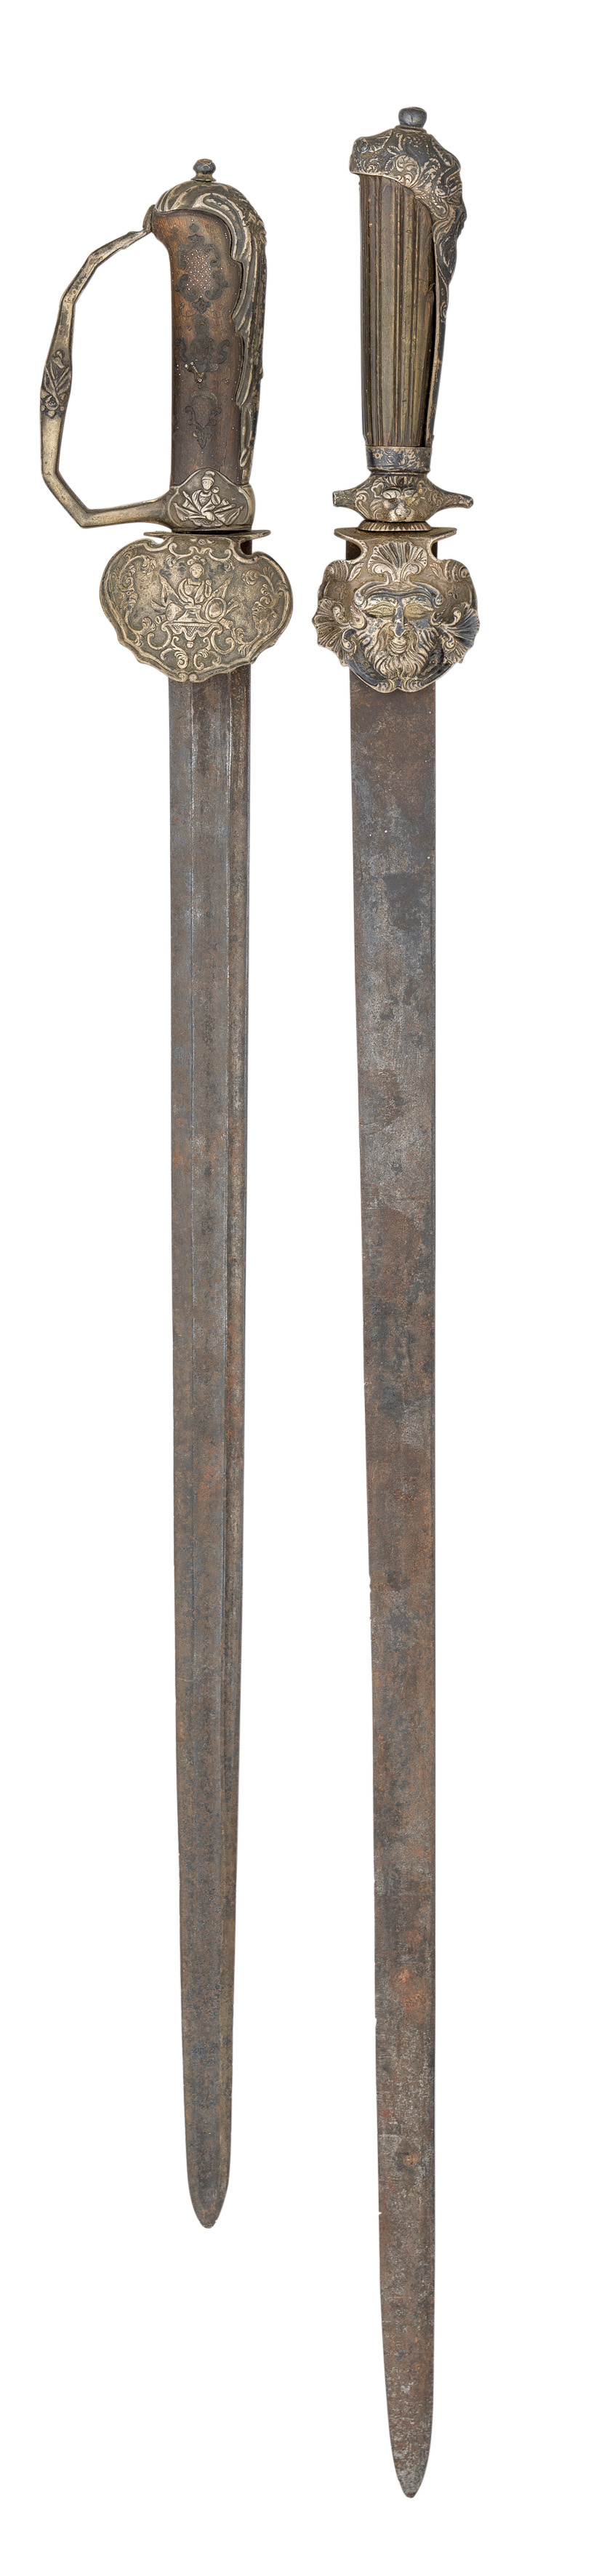 Ⓦ THREE ENGLISH HUNTING SWORDS^ CIRCA 1750